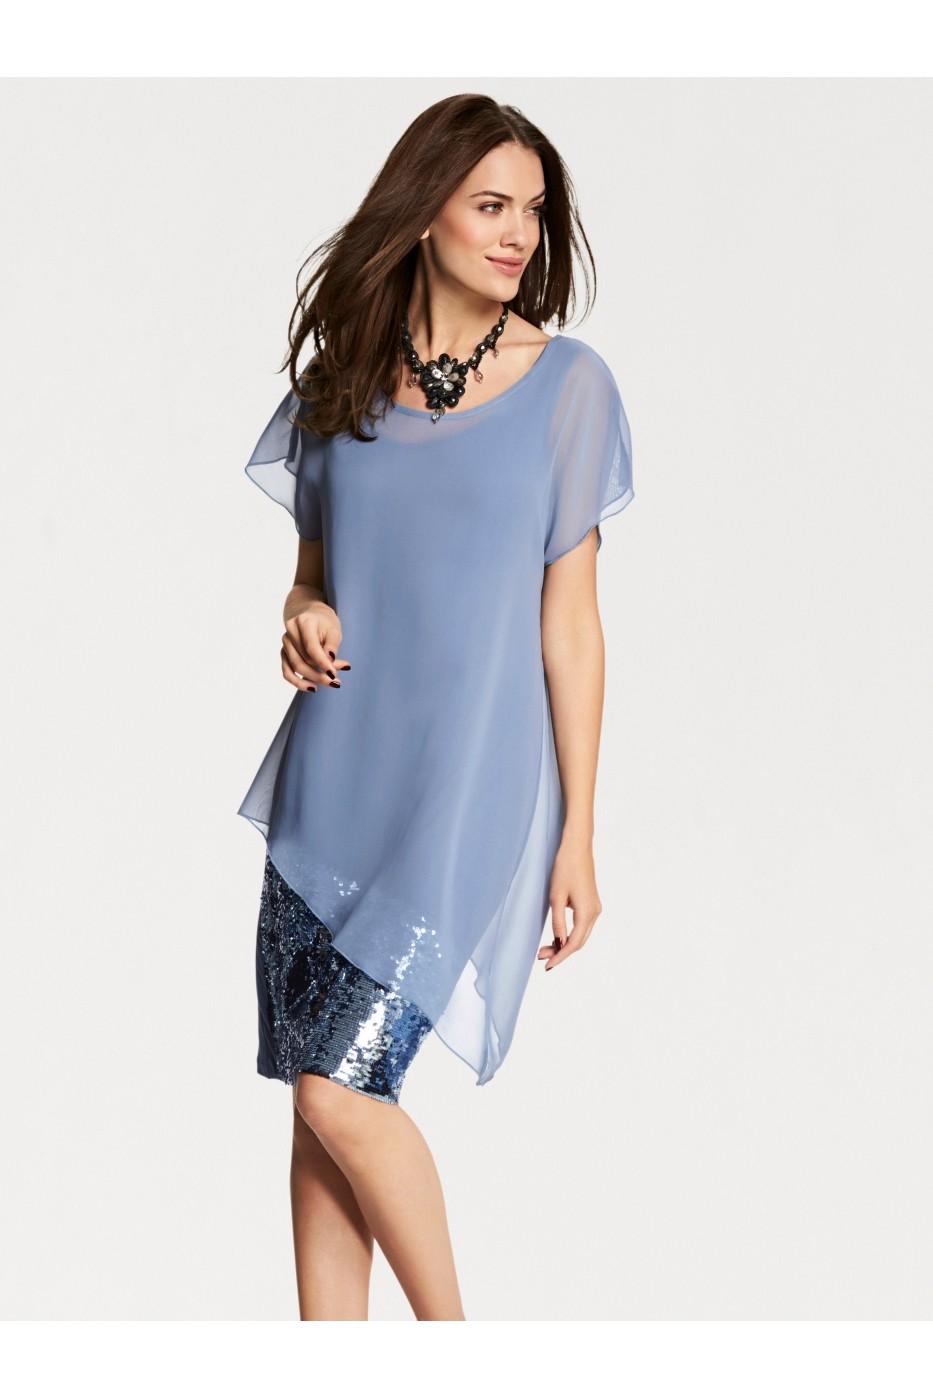 Estélyi ruha heine TIMELESS 8020 Kék - FashionUP! 6639fdded2